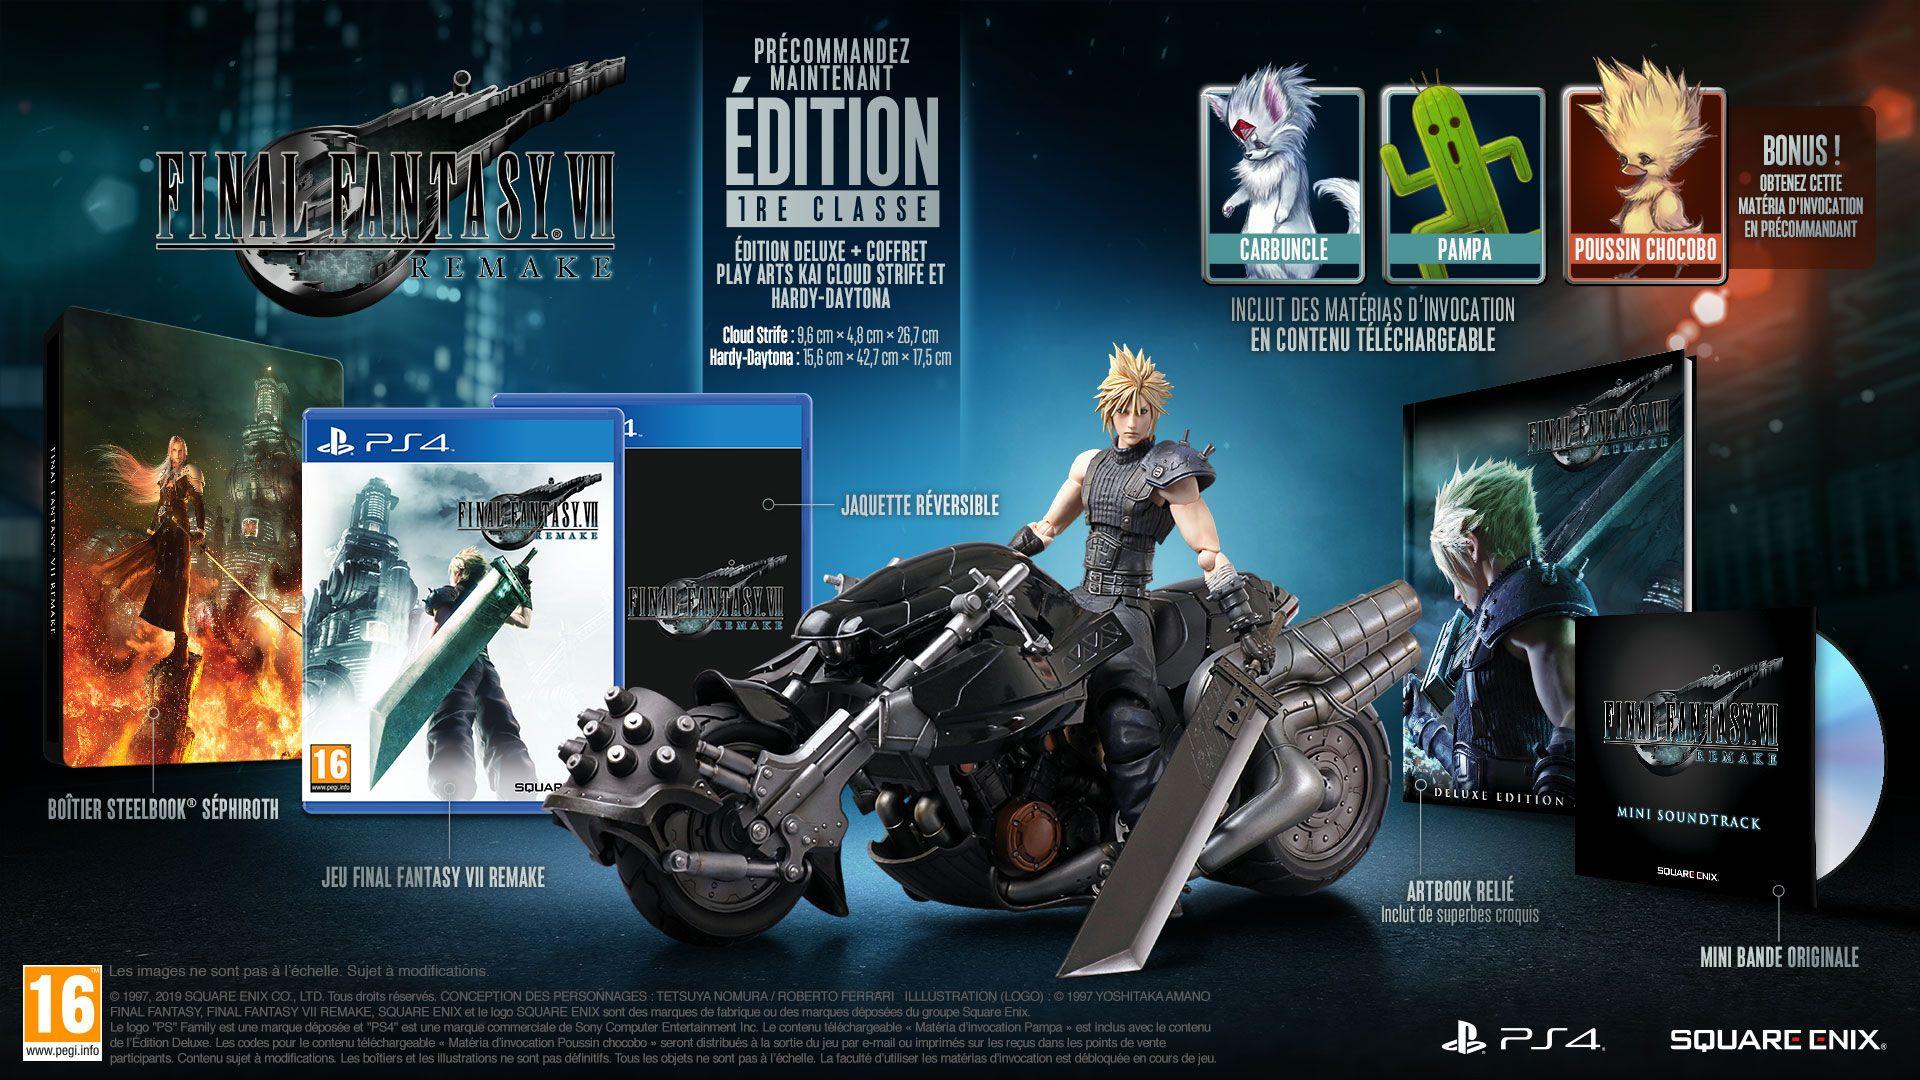 Final Fantasy [Jeu vidéo] - Page 39 704b9499d99c3fc23ebc2b42428fc646_1920_KR